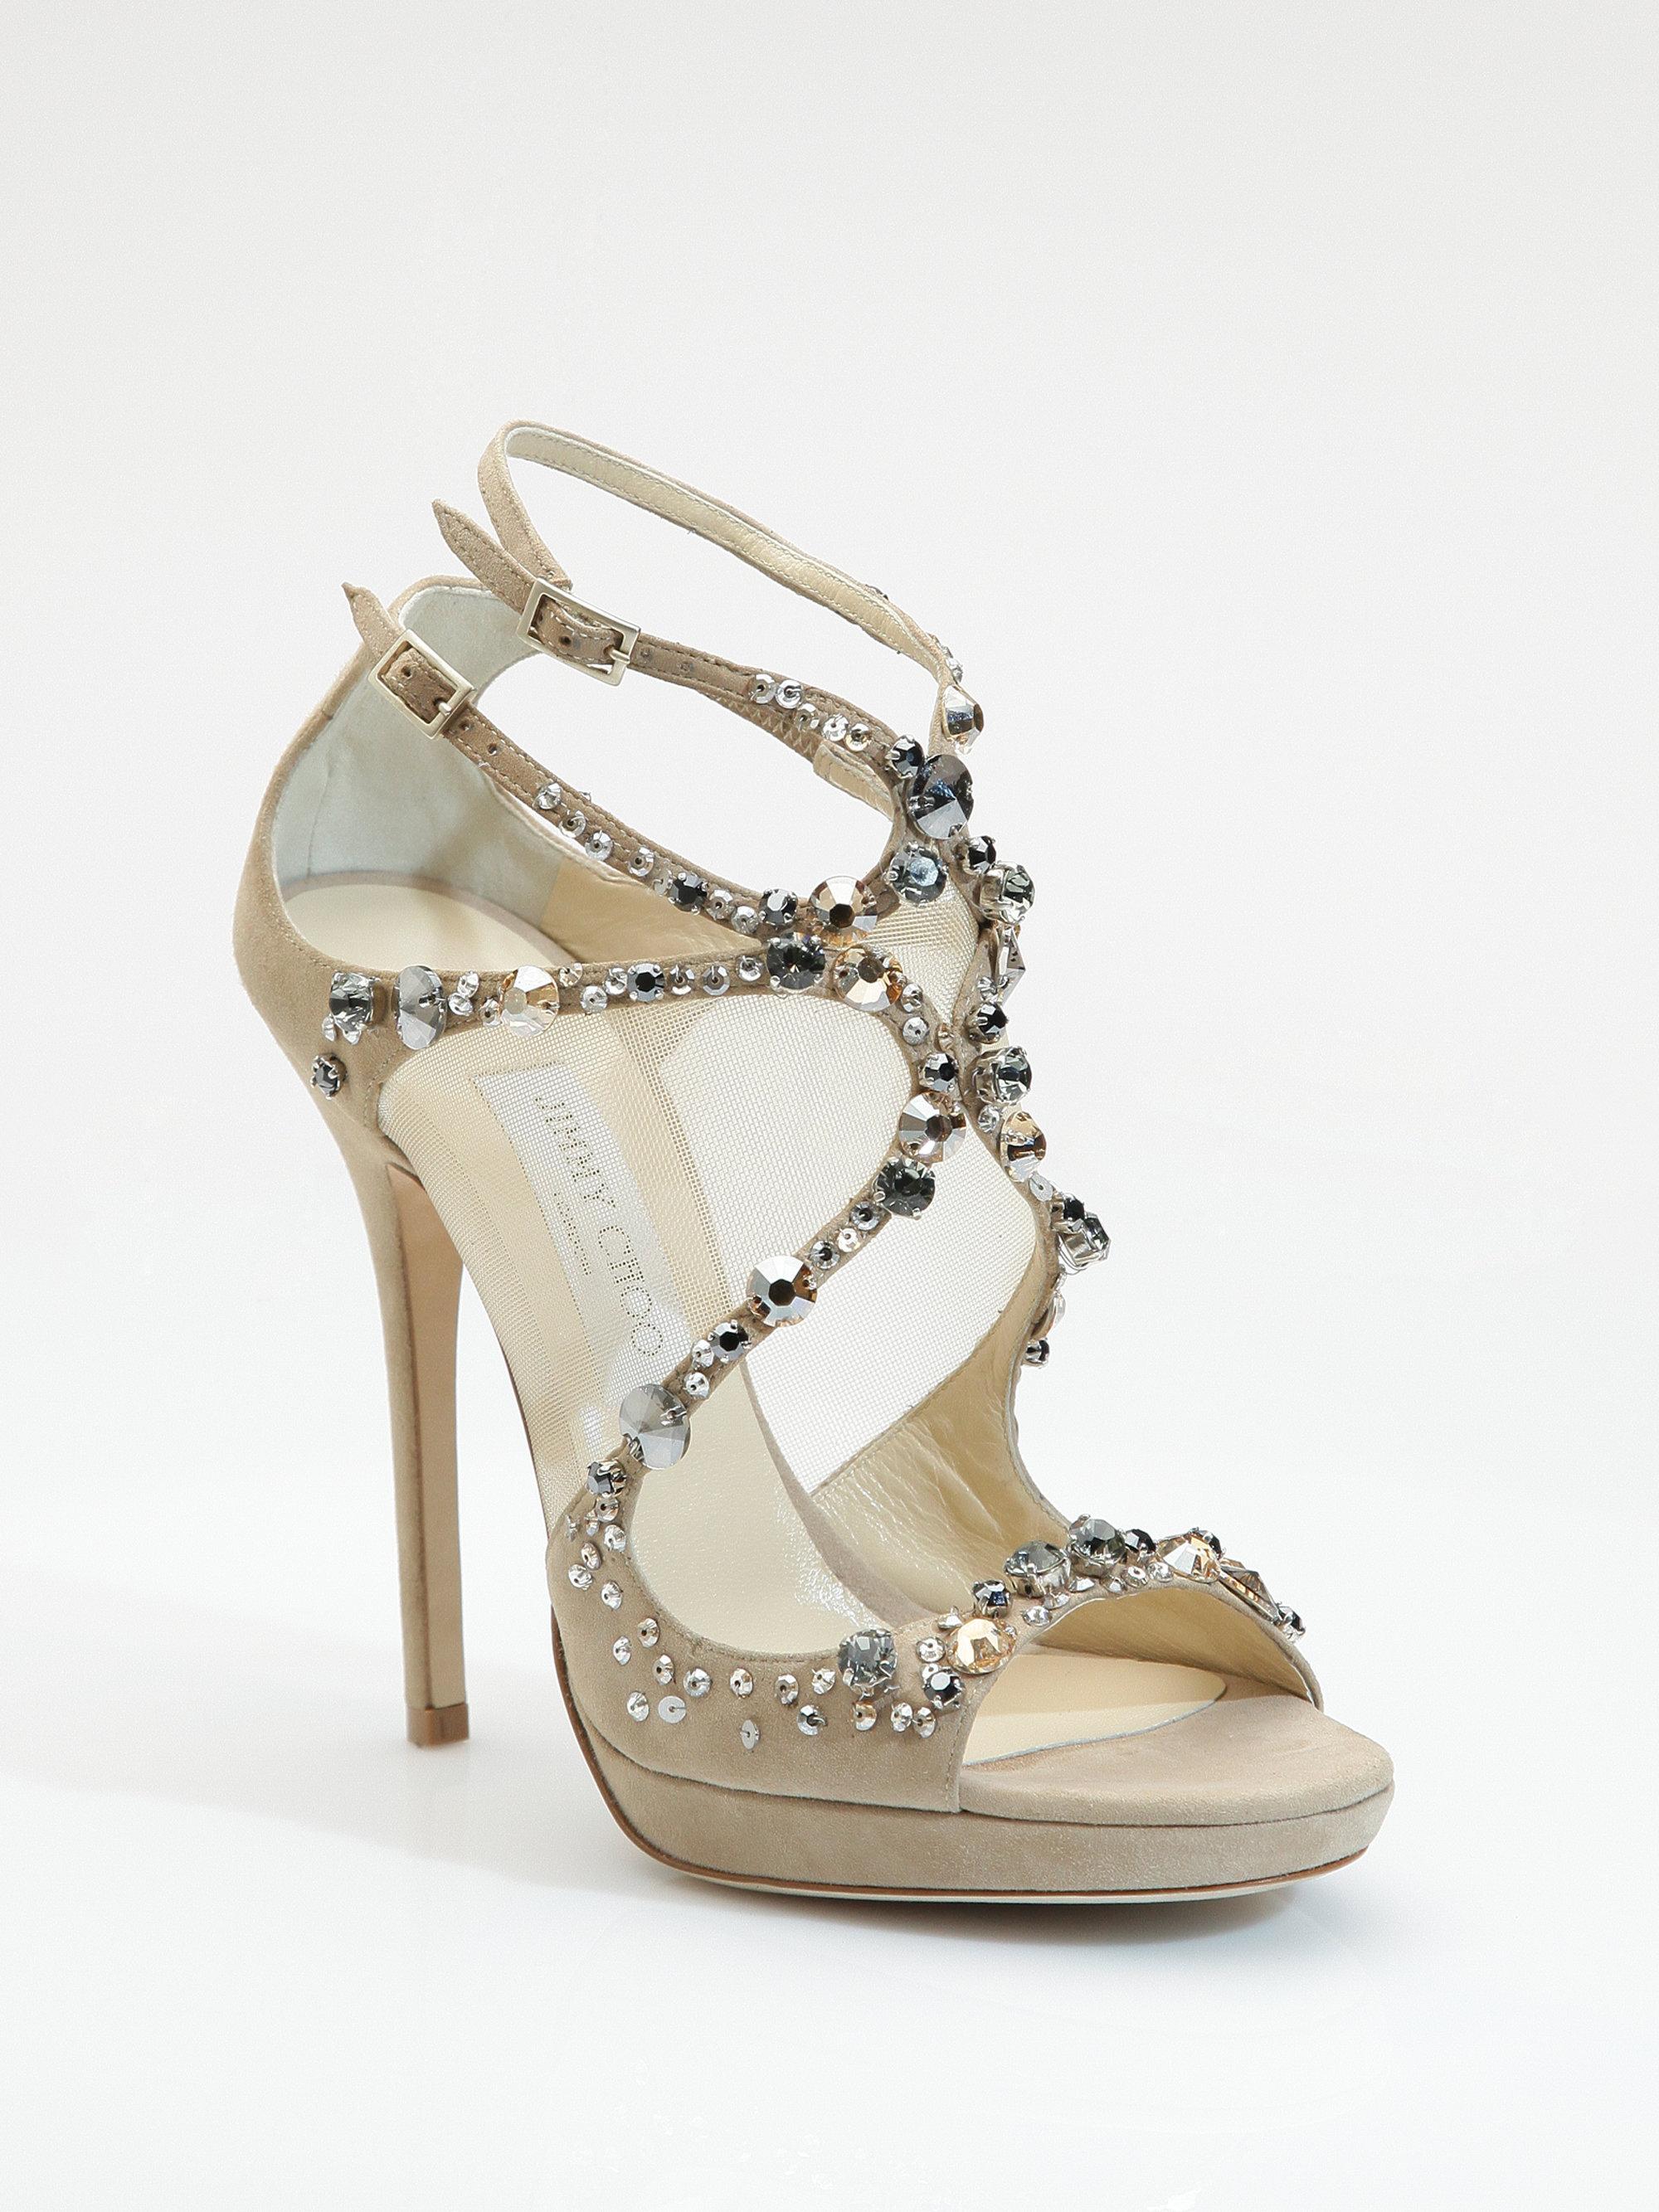 098e92bb7638 Lyst - Jimmy Choo Viola 125 Crystal Suede Sandals in Black